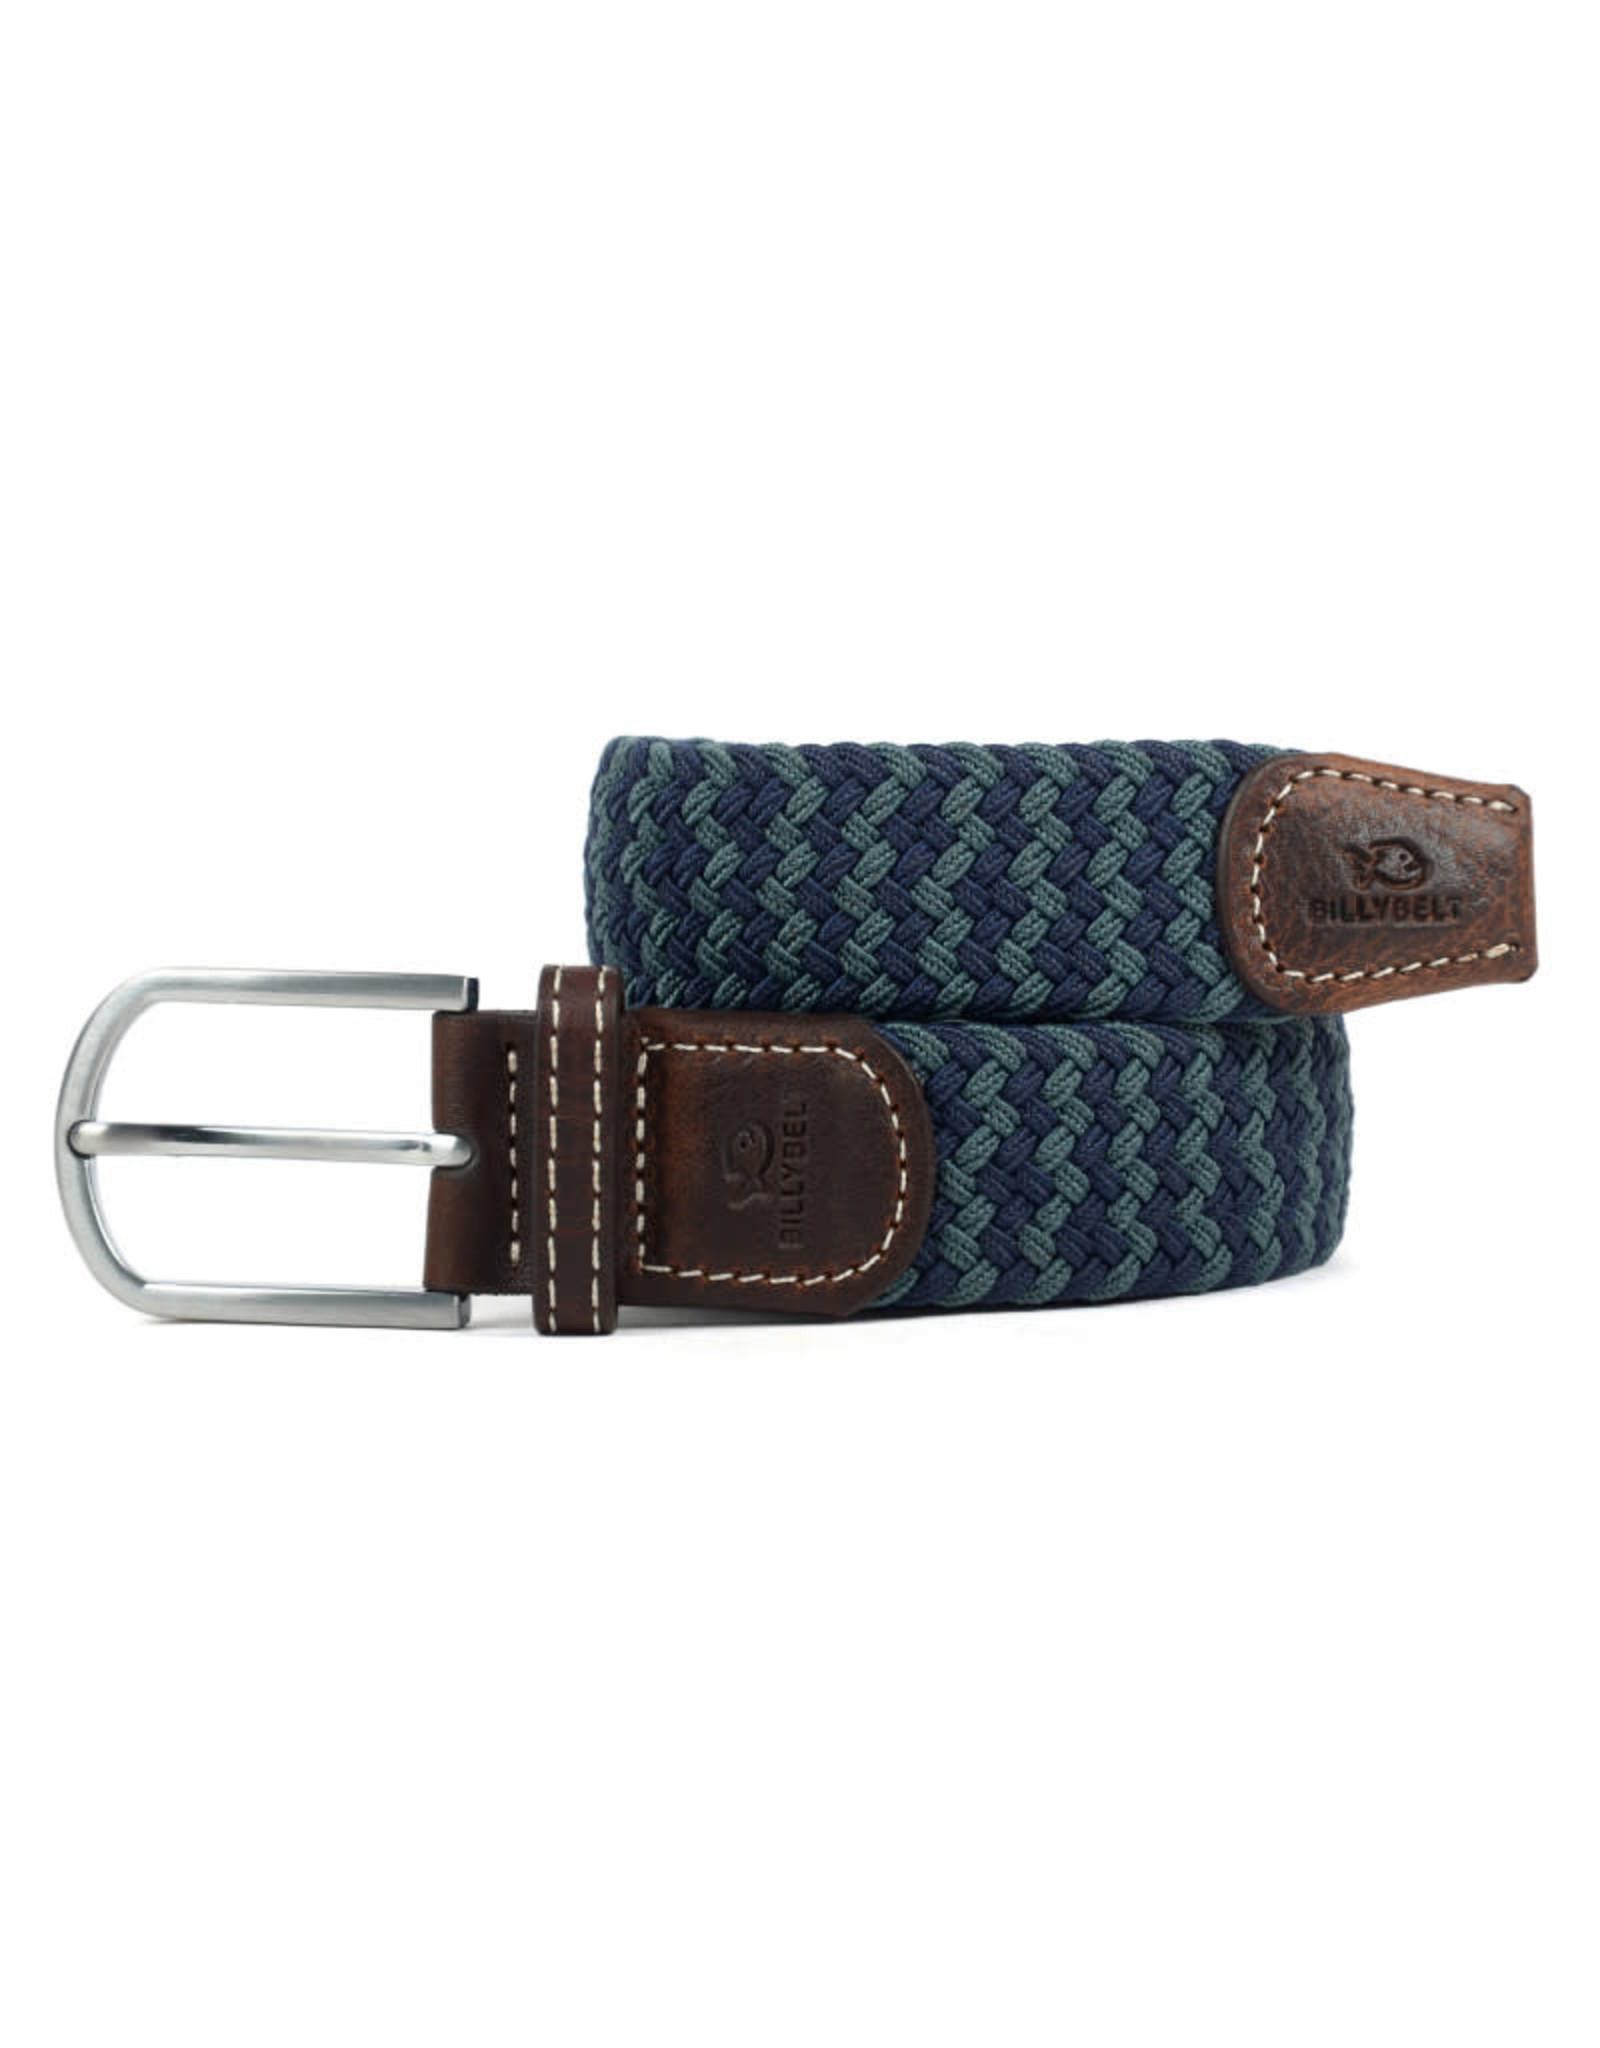 Riem zigzag donkerblauw/groen T1